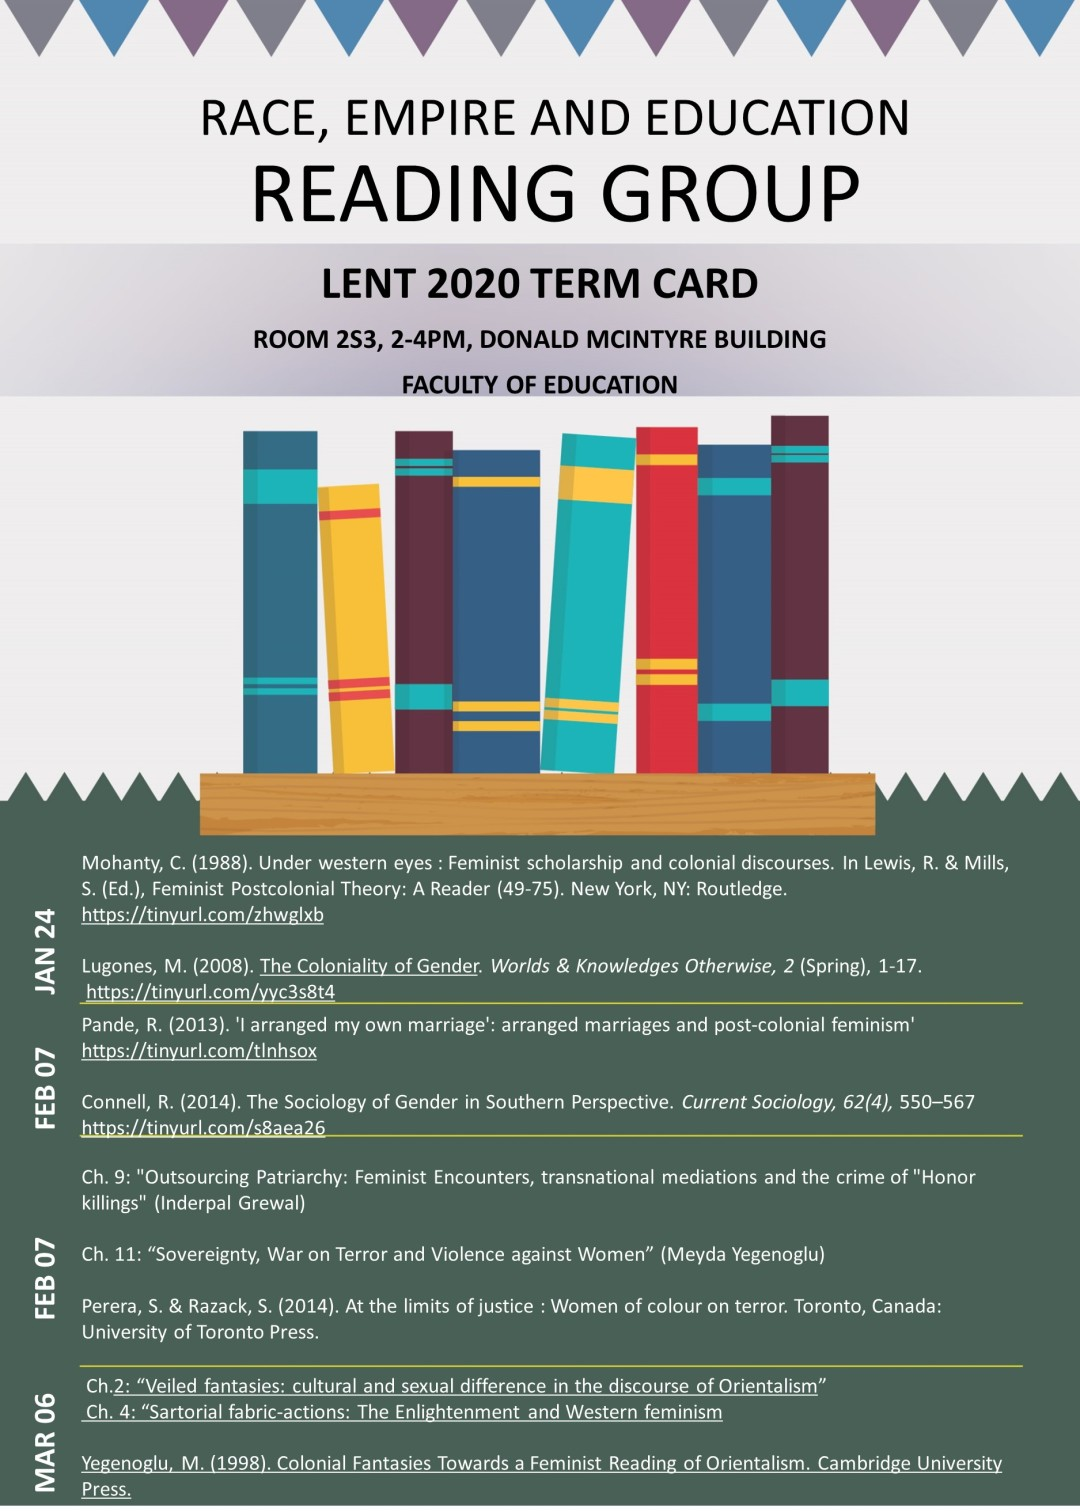 REE_lent 2020_poster